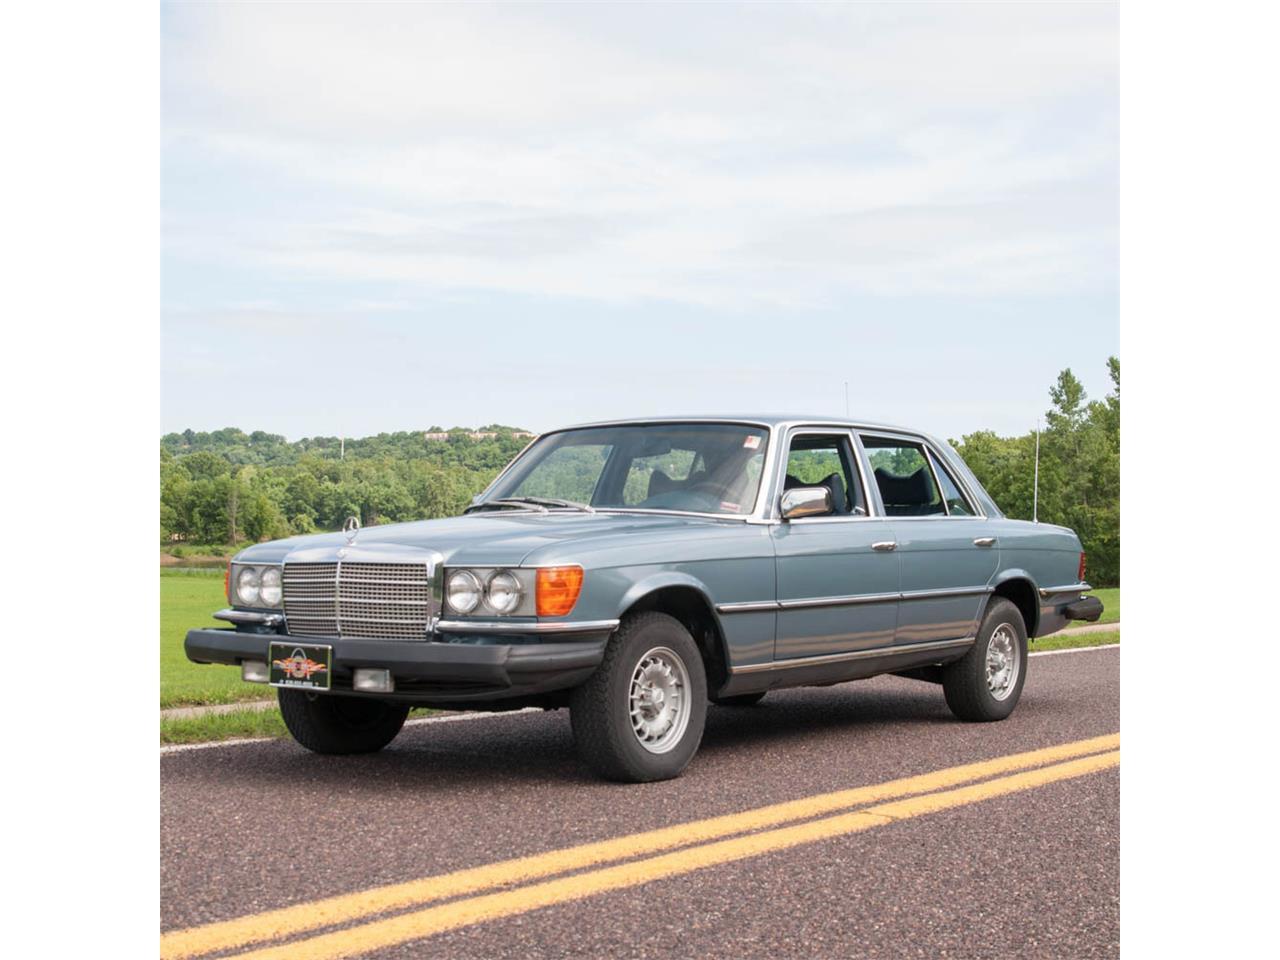 1977 mercedes benz 450sel for sale cc for Mercedes benz st louis service